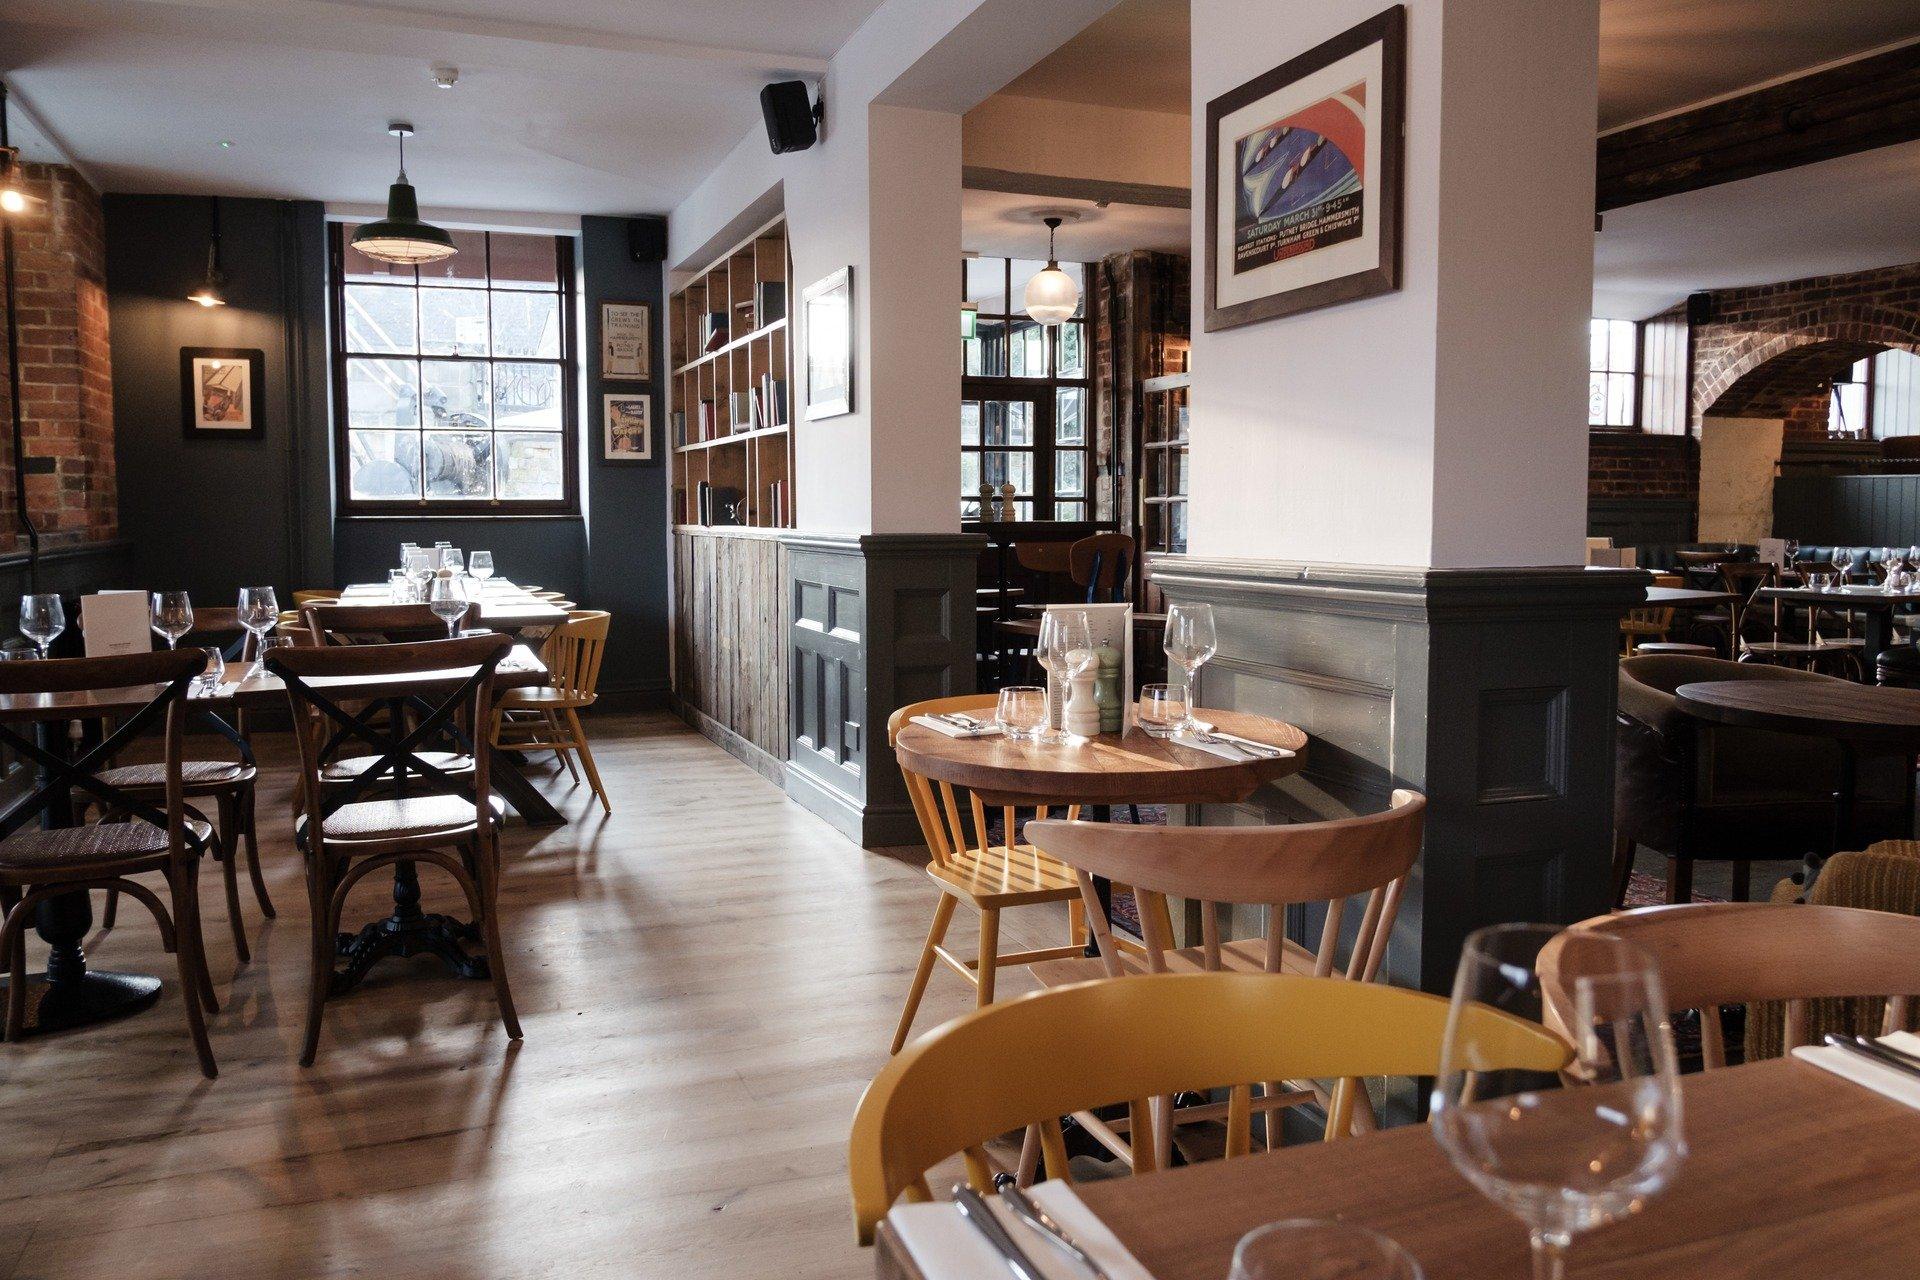 The Head of the River Restaurant, Pub & Bar Oxford - Interior